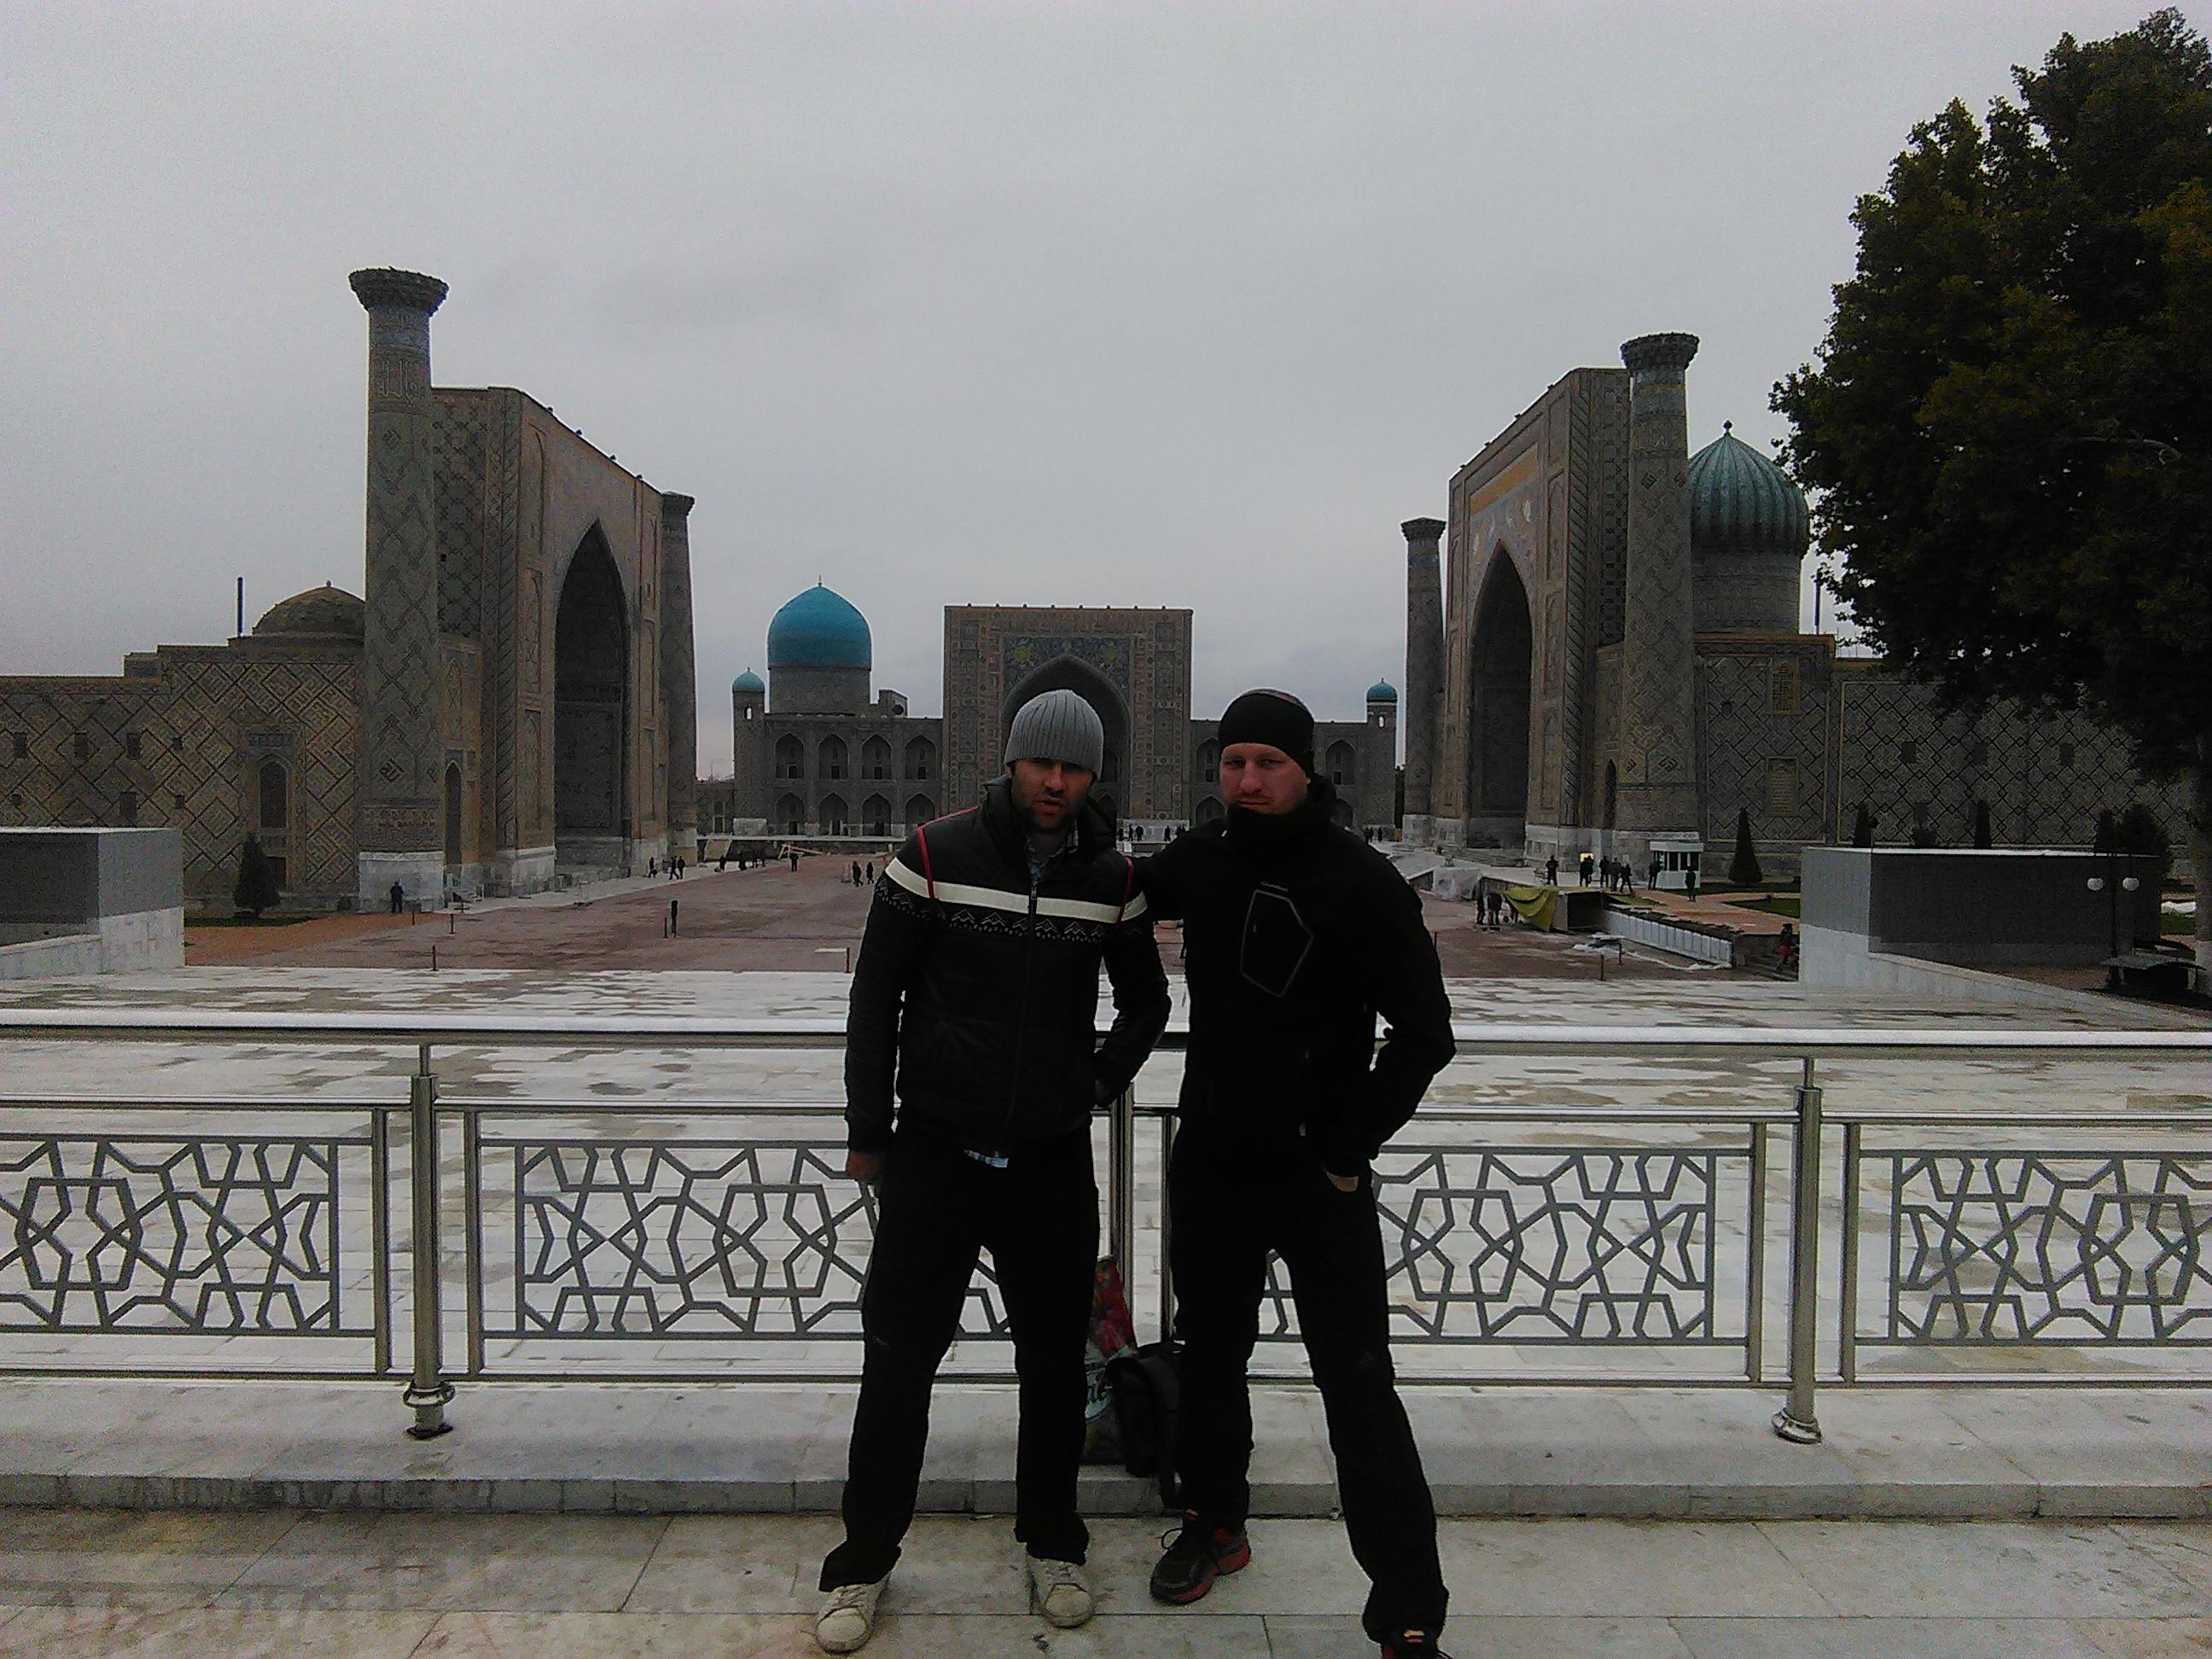 Uzbekistan travel guide for backpackers